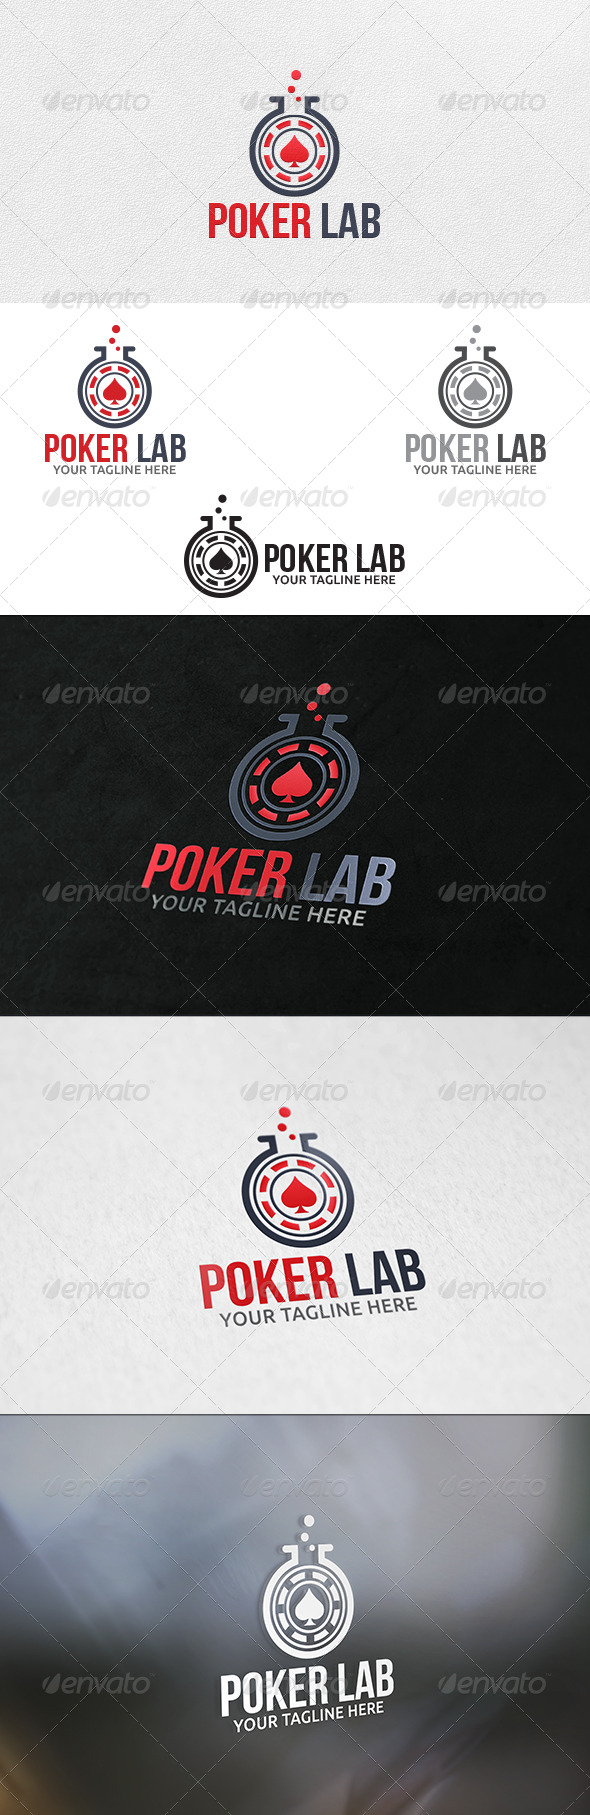 GraphicRiver Poker Lab Logo Template 6369758